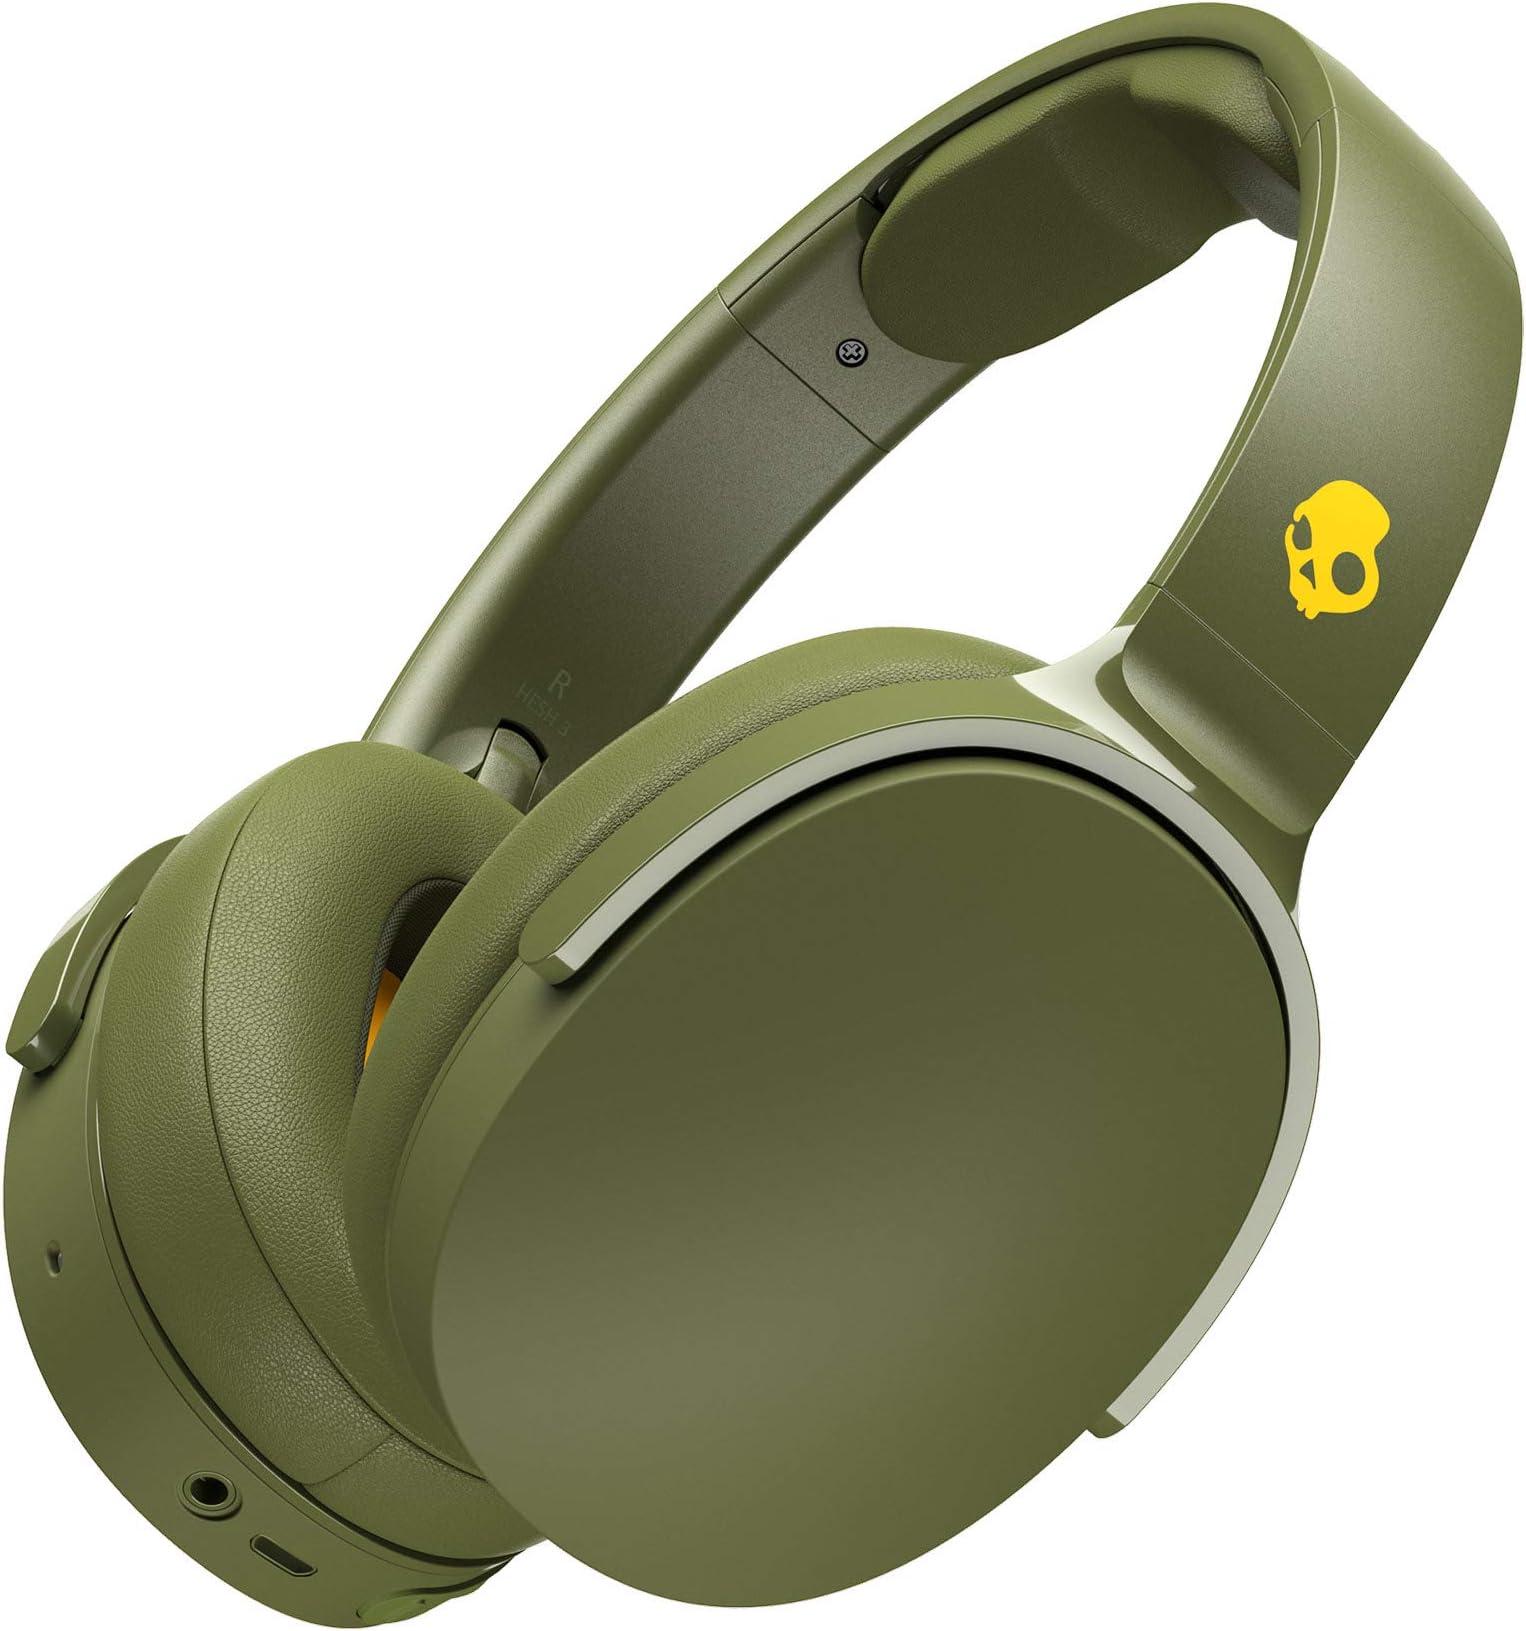 Skullcandy Hesh 3 Wireless Over-Ear Headphone - Moss